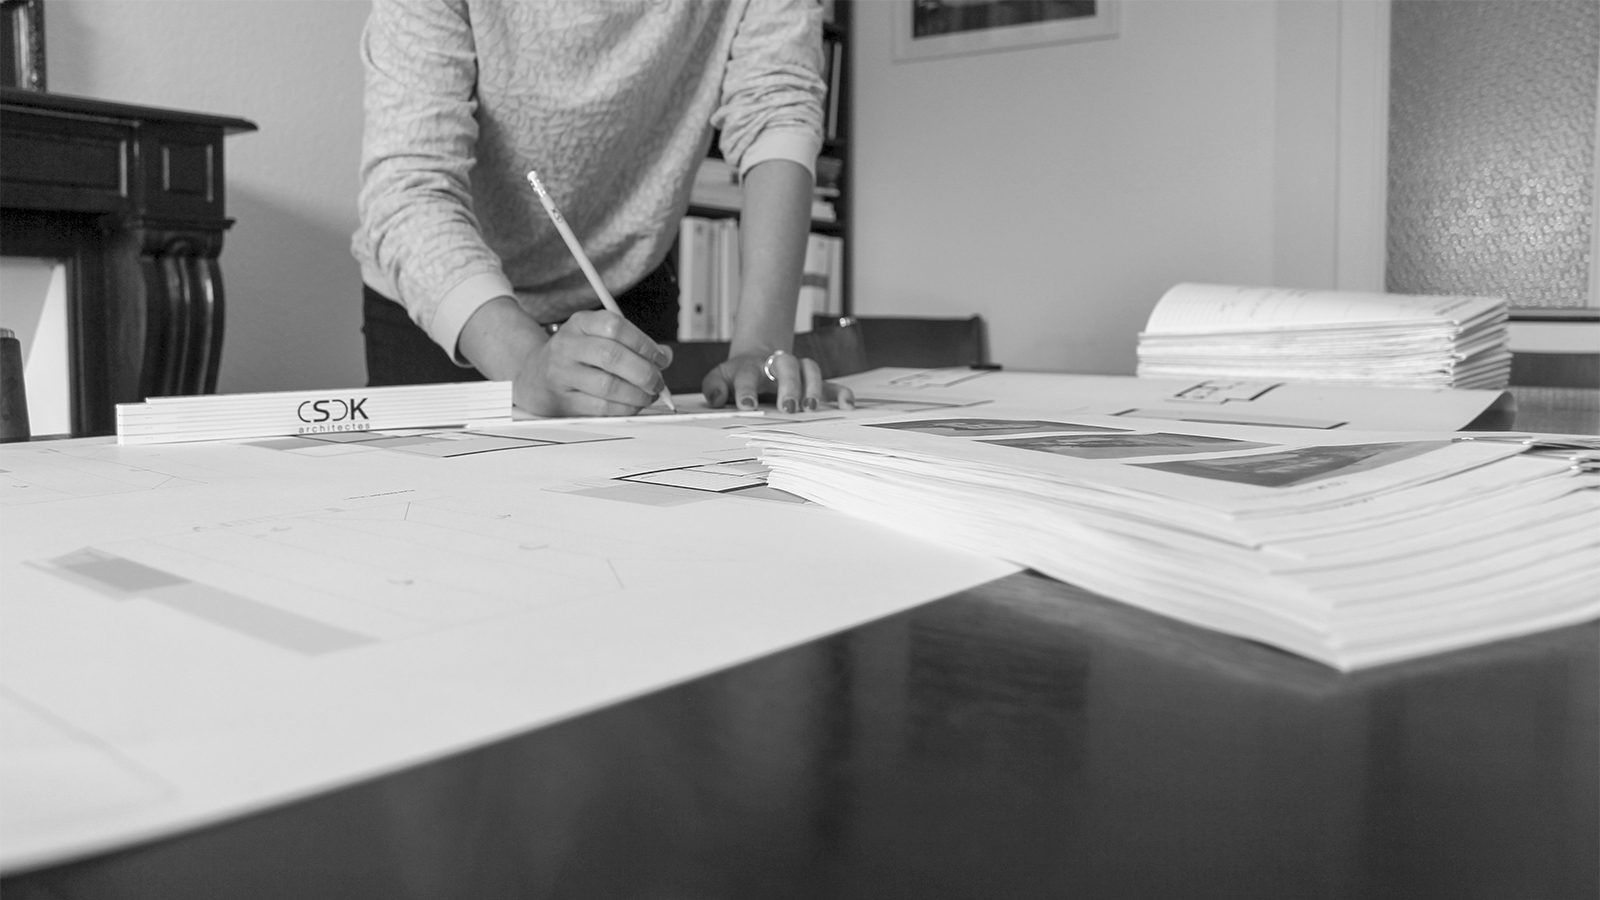 CSDK Architectes bureau darchitectes emplois 2 1600x900 1 - Offre d'emploi - CSDK Architectes bureau darchitectes emplois 2 1600x900 1